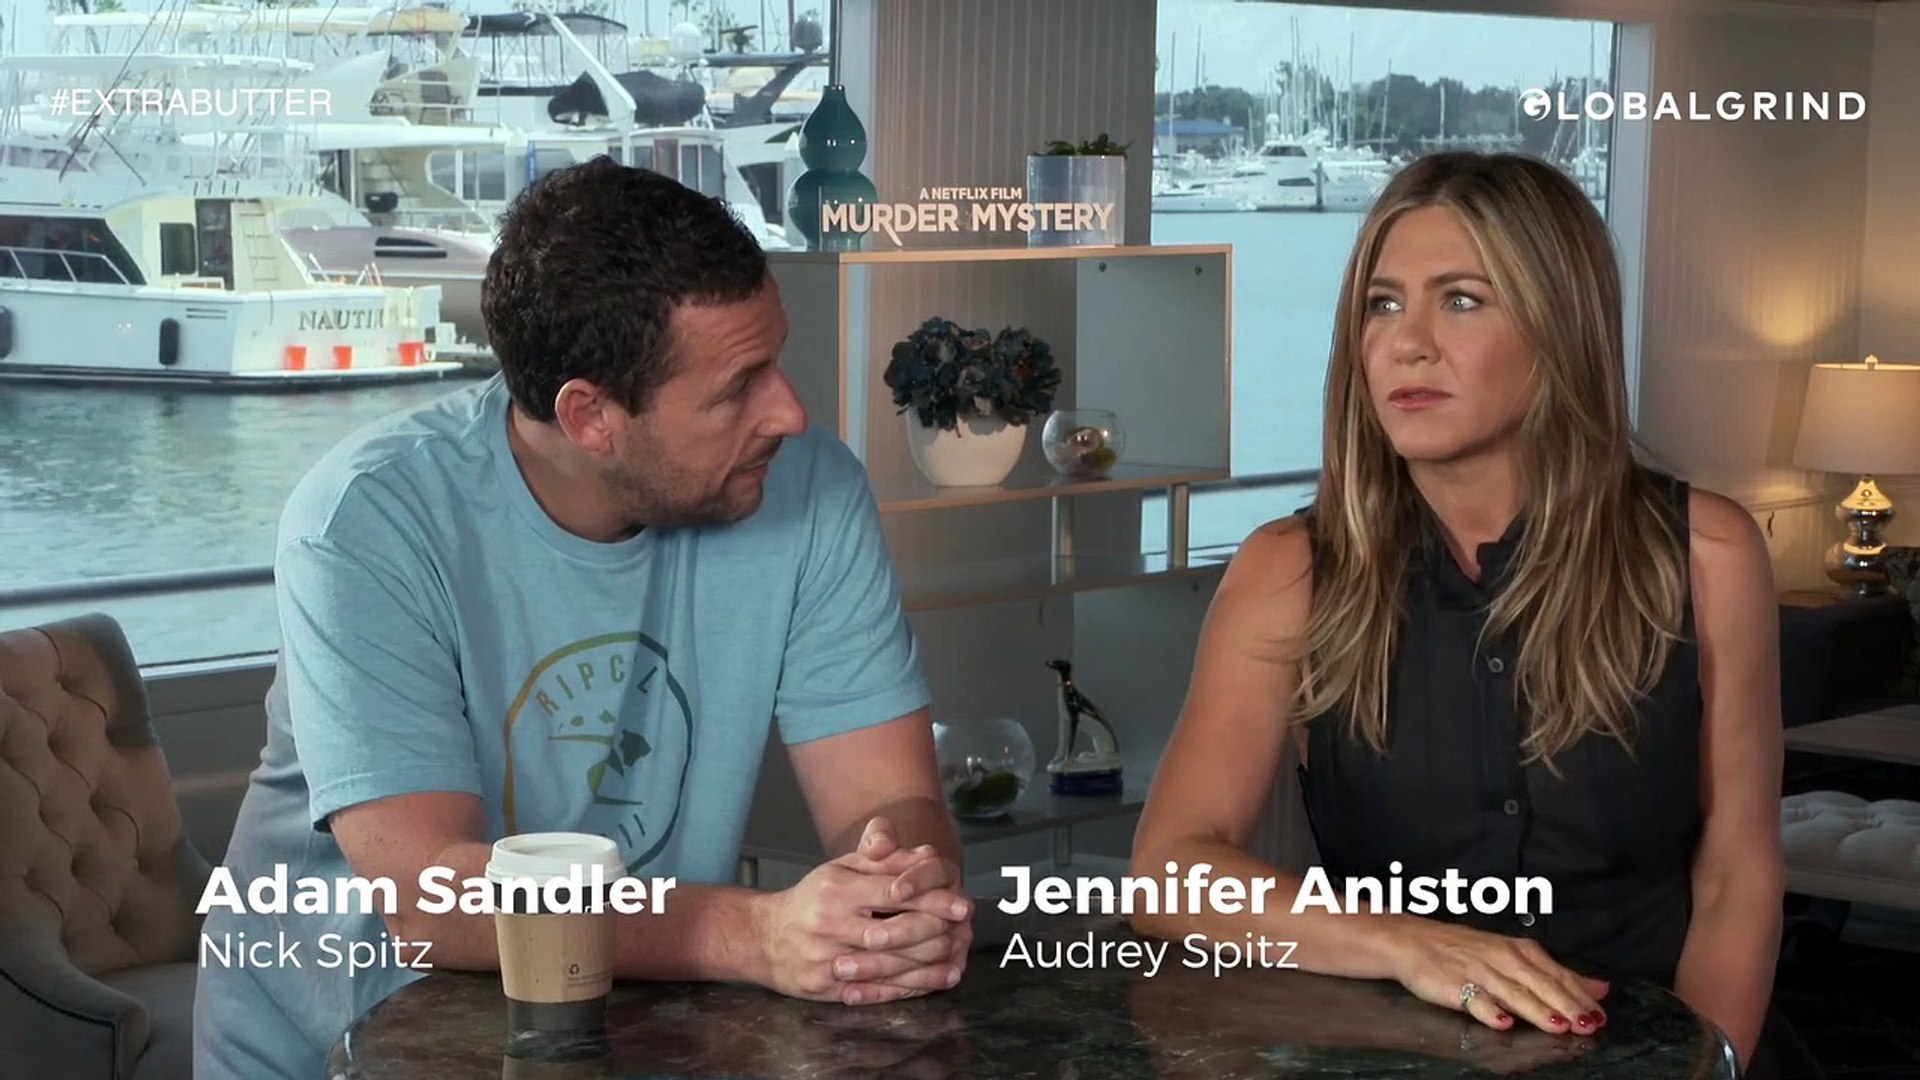 Adam Sandler Clowns Jennifer Aniston On Taking Long To Do Murder Mystery    Extra Butter